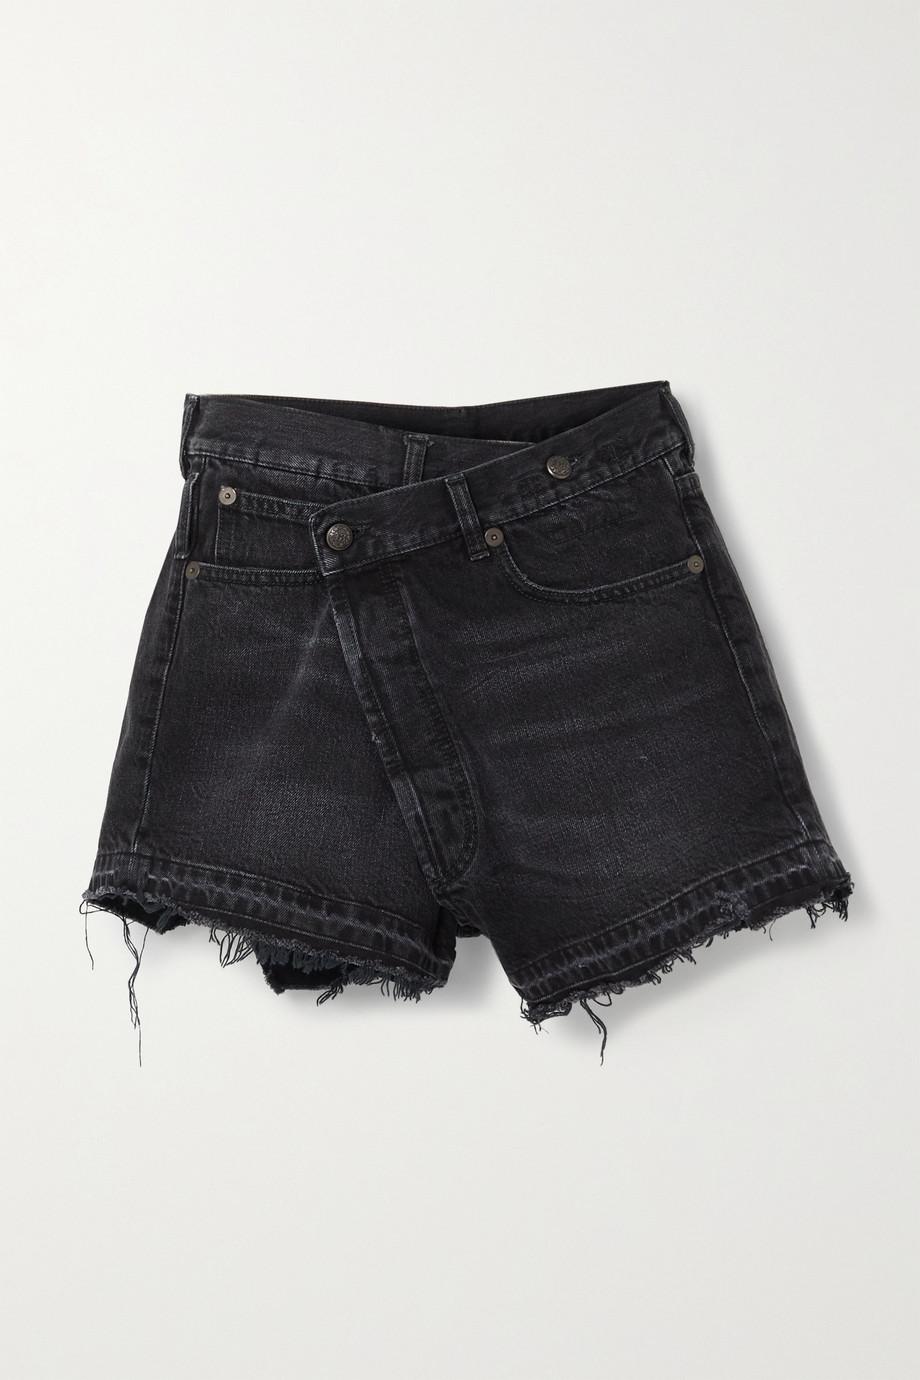 R13 Crossover asymmetric distressed denim shorts